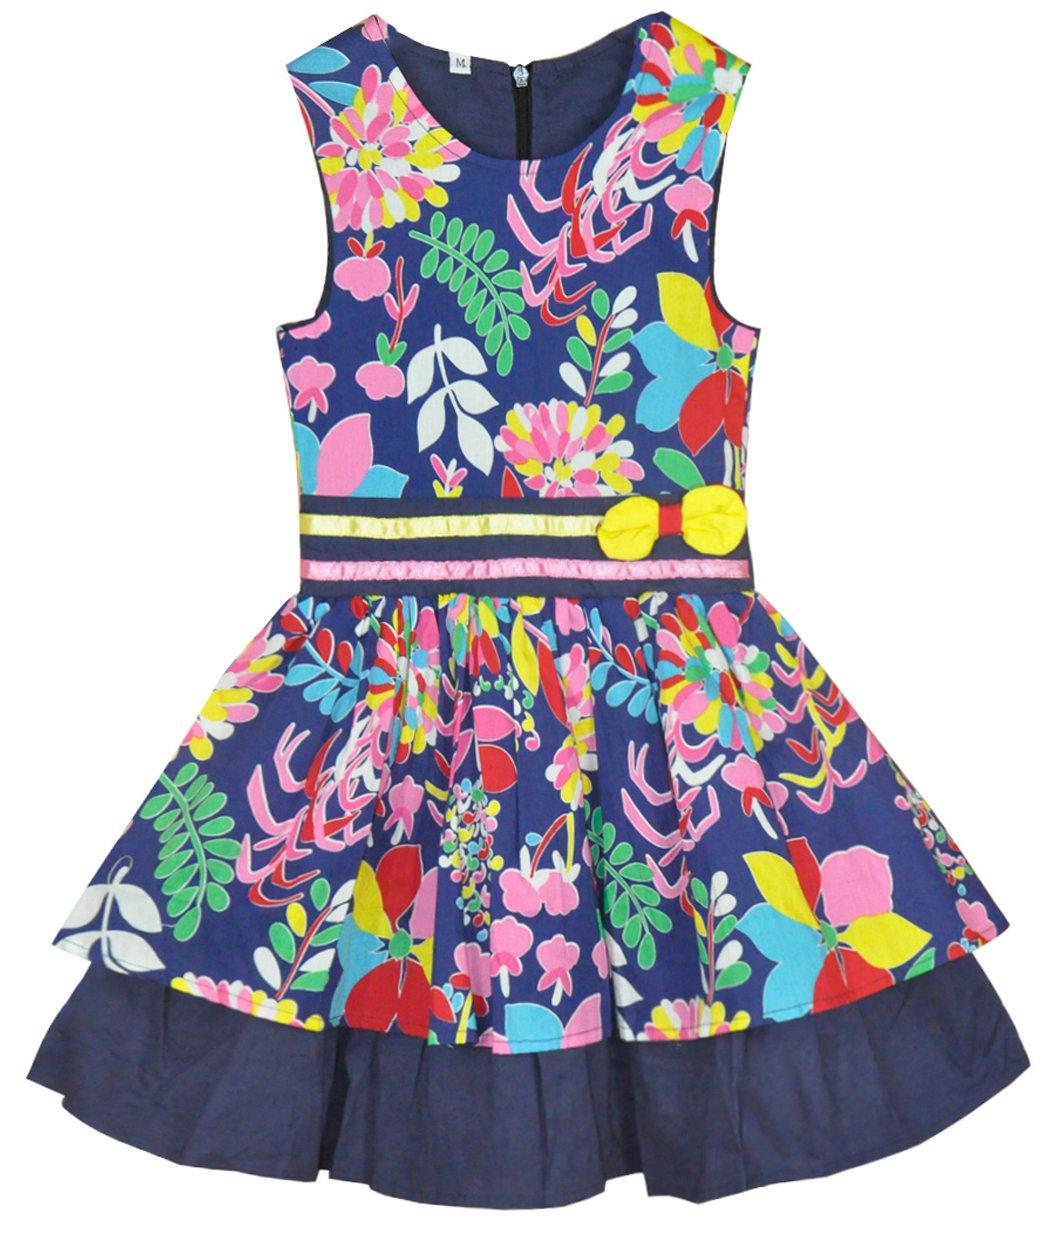 Dhasiue Little Girls Sleeveless Dresses Cotton Casual Summer Sundress Flower Printed Dress